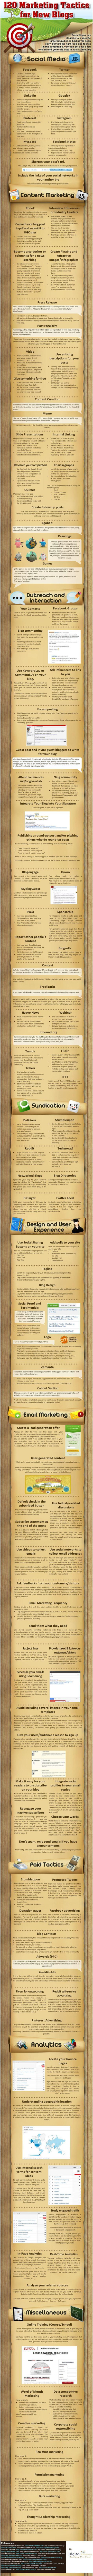 120-marketing-tactics-for-new-blogs_5256ebf72fc43